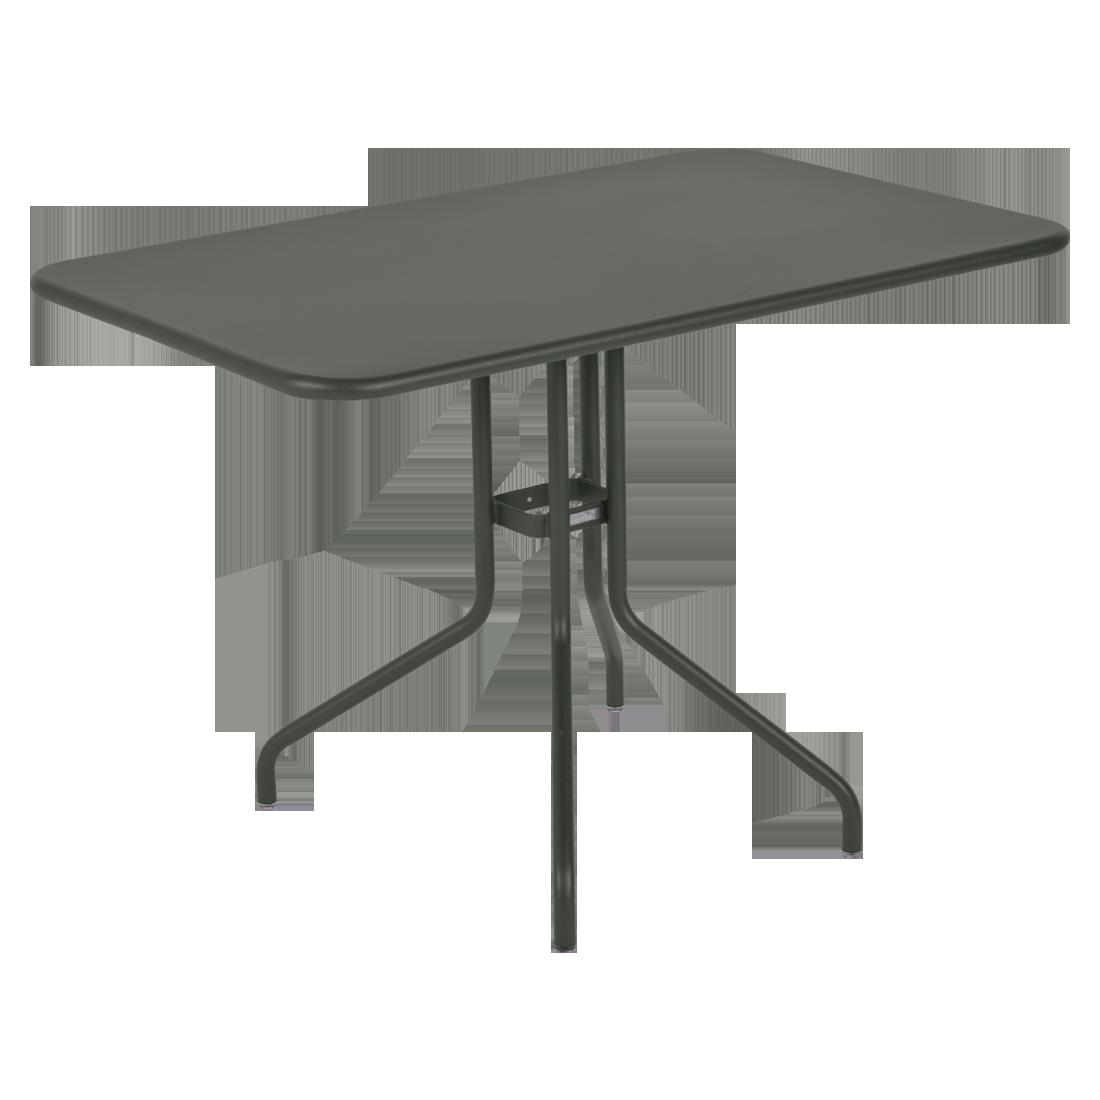 table restaurant, table terrasse, table metal, table pliante metal, mobilier restaurant, table pliante verte